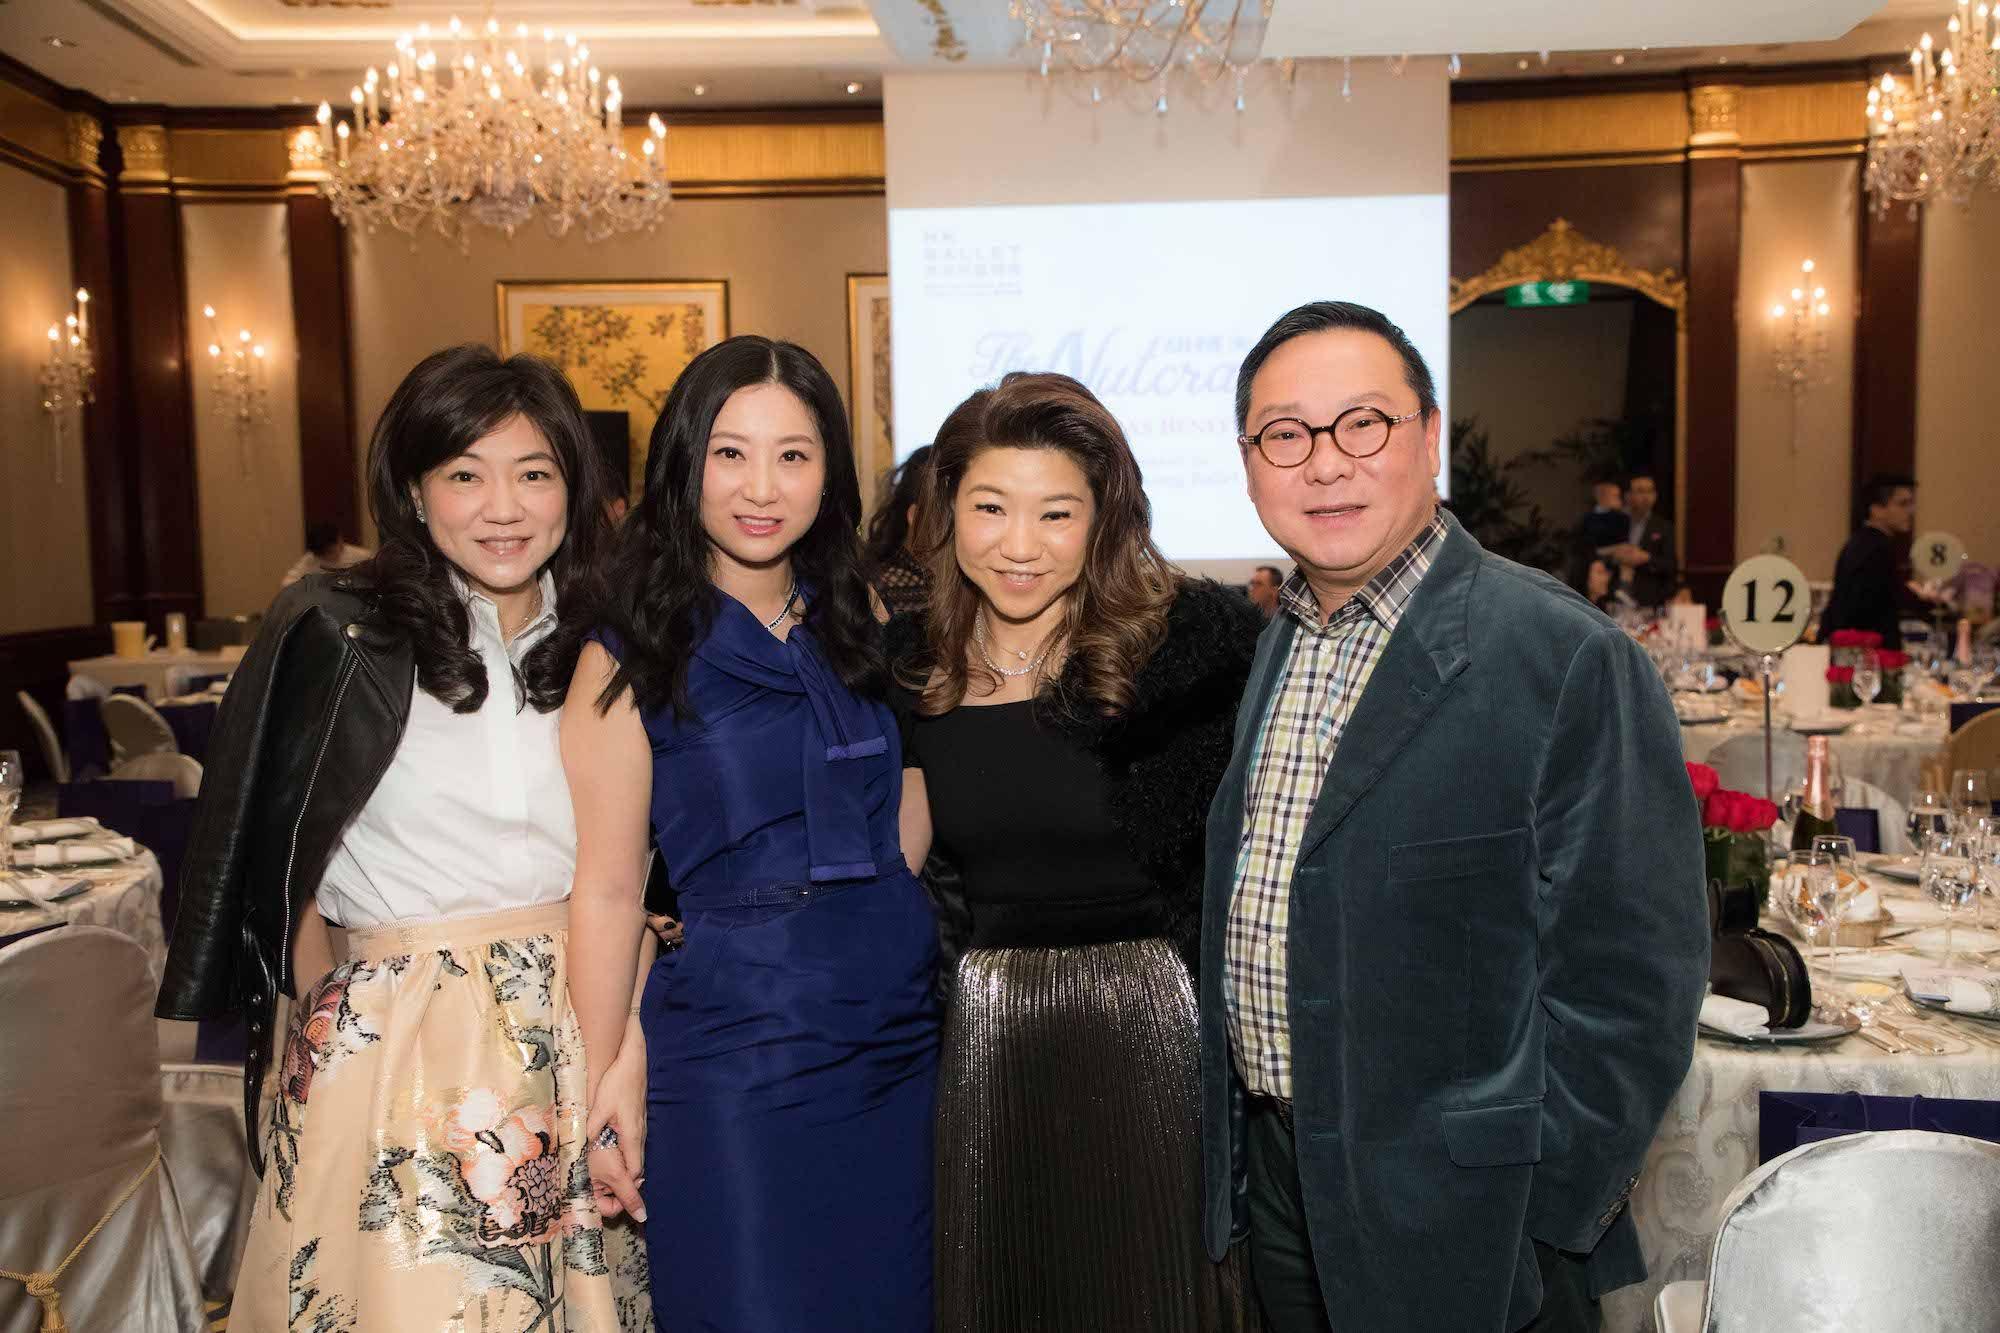 Viola Cheong, Lillian Lee-Fong, Vanessa Kwan, Michael Kwan